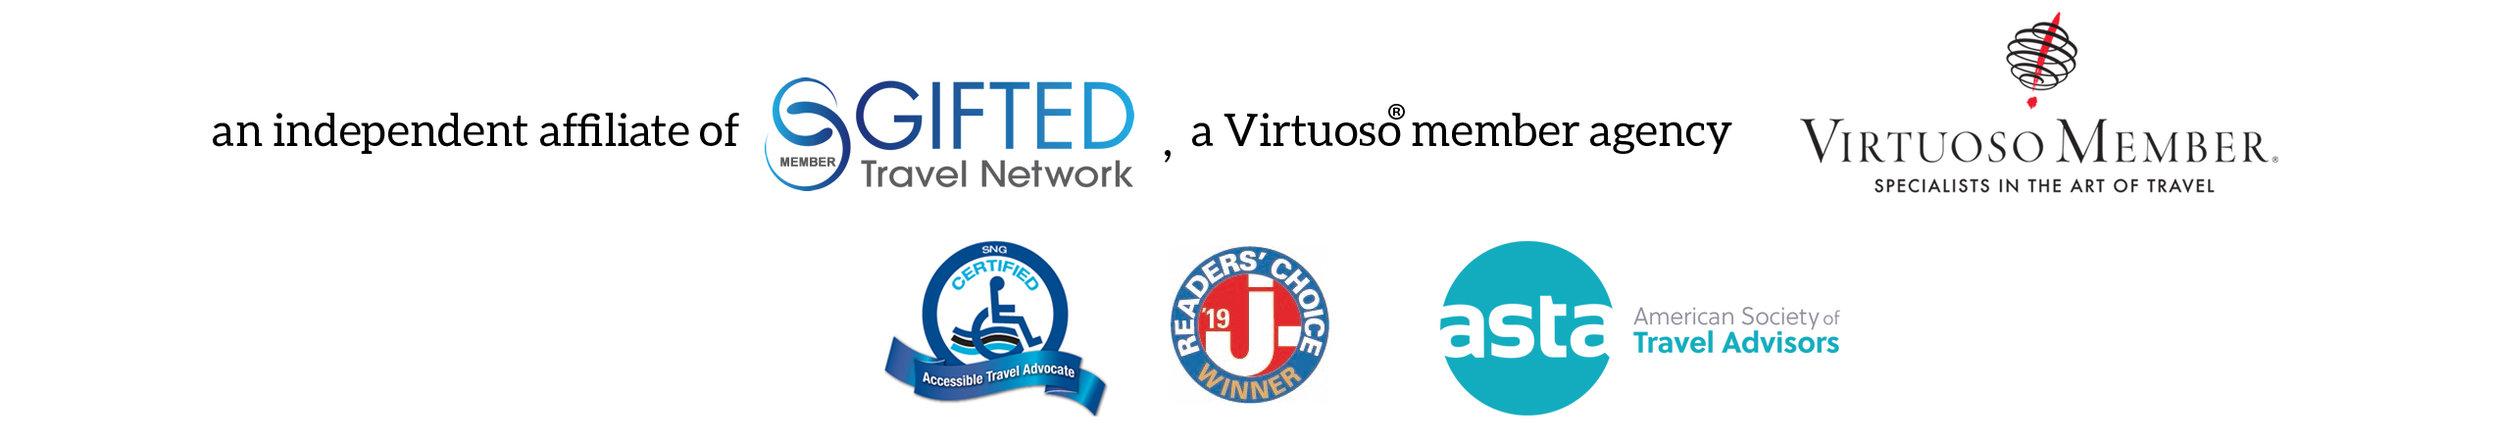 logos website sandy_2019.jpeg